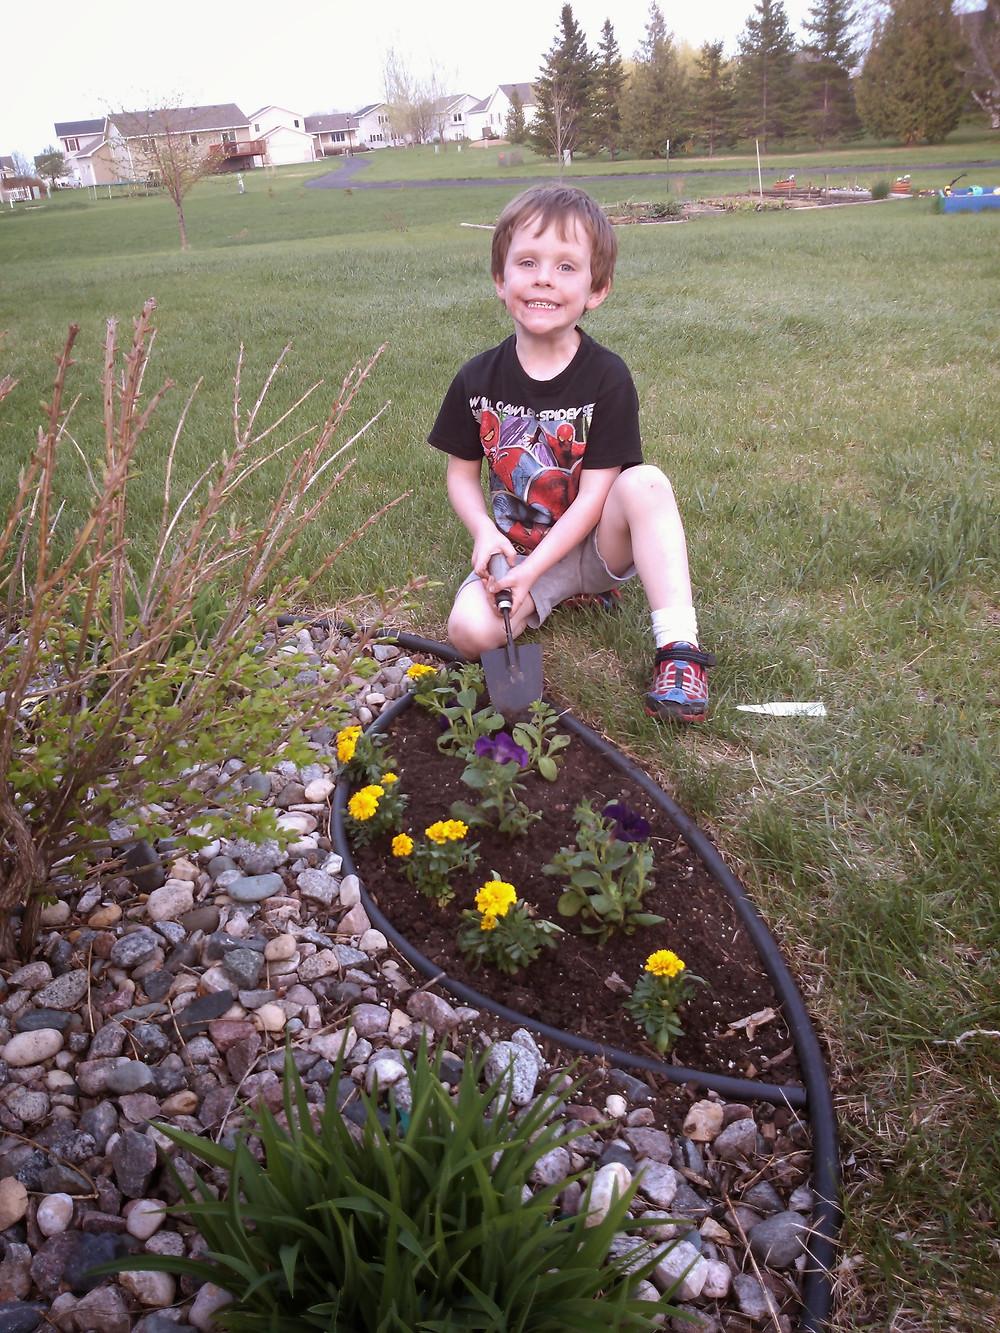 Jax gardening 5 years old